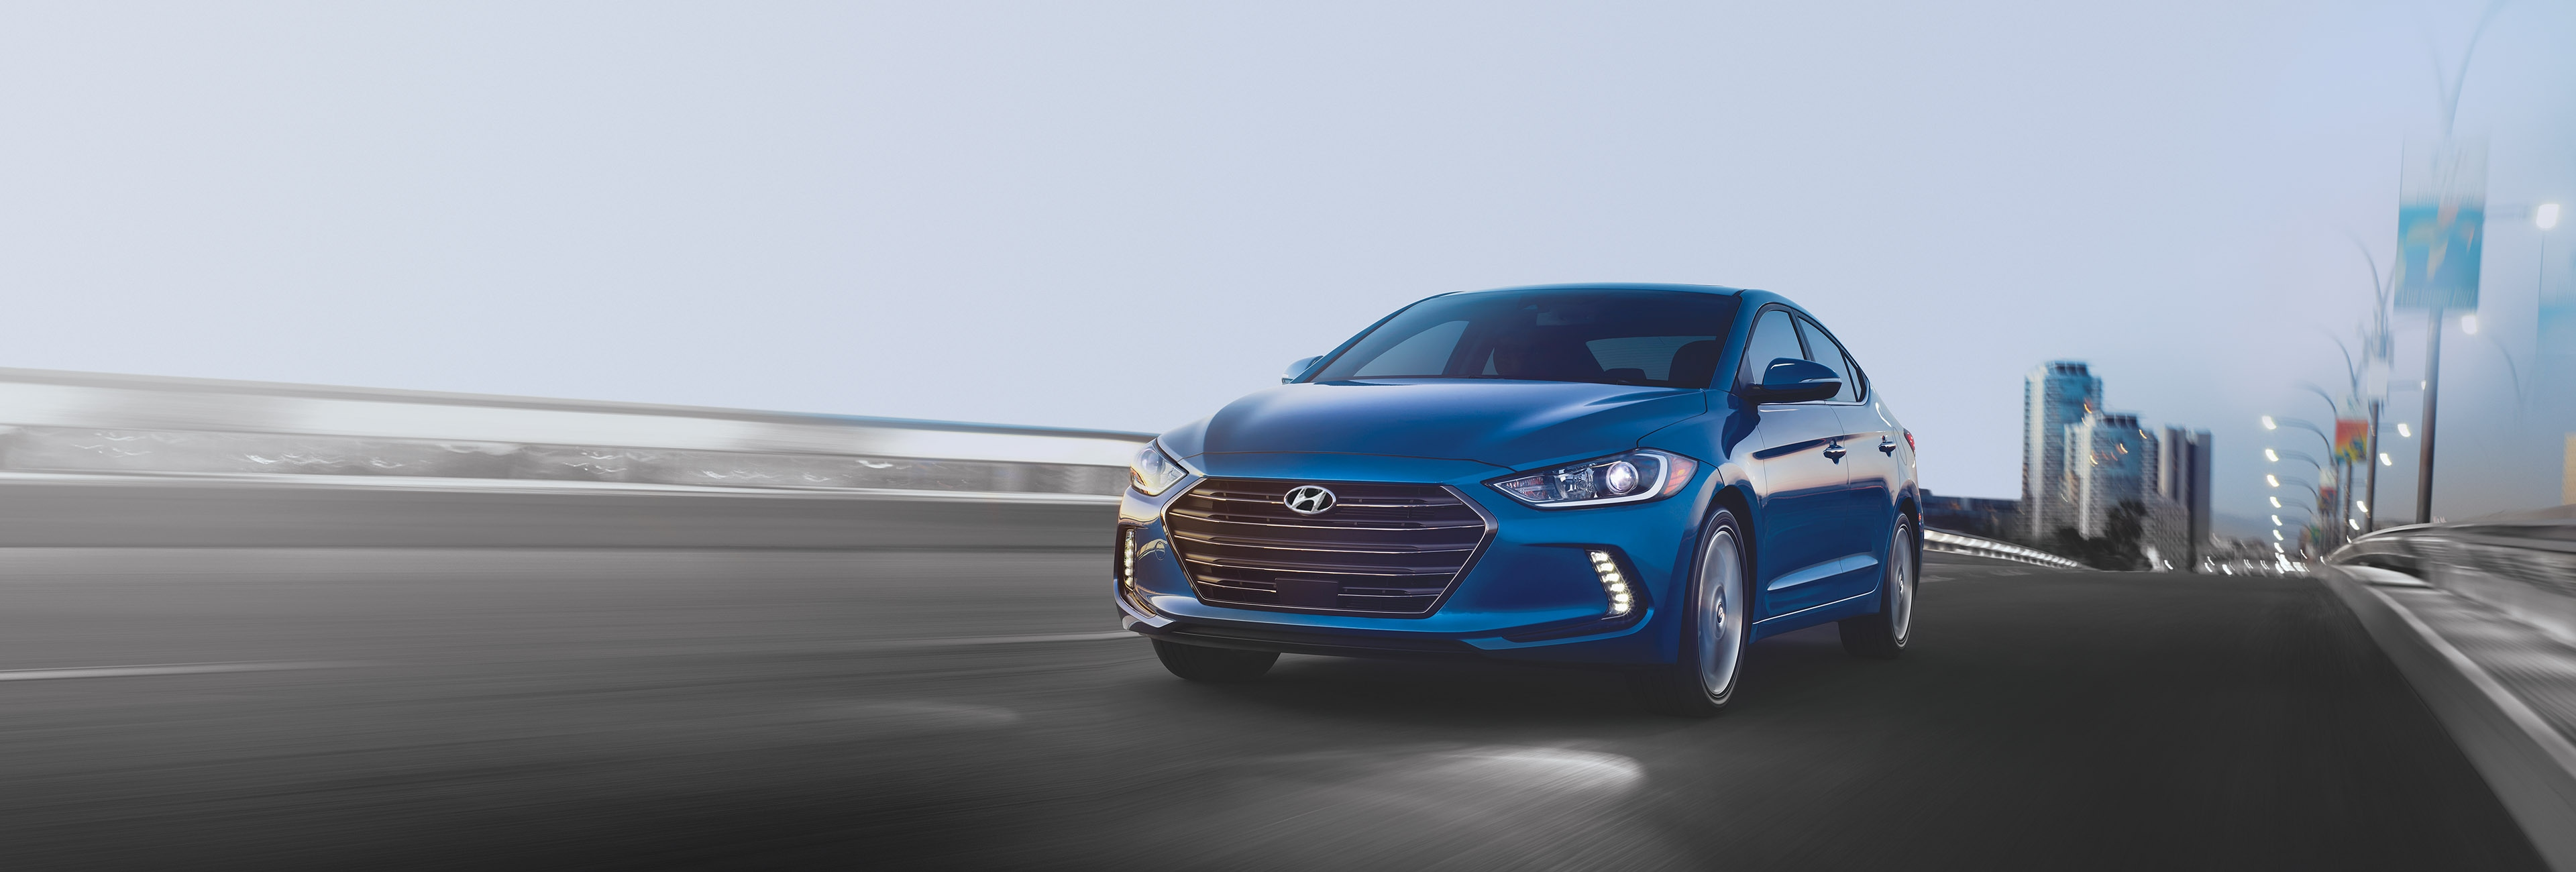 Hyundai Elantra 2018 Reviews & Ratings | Hyundai Canada